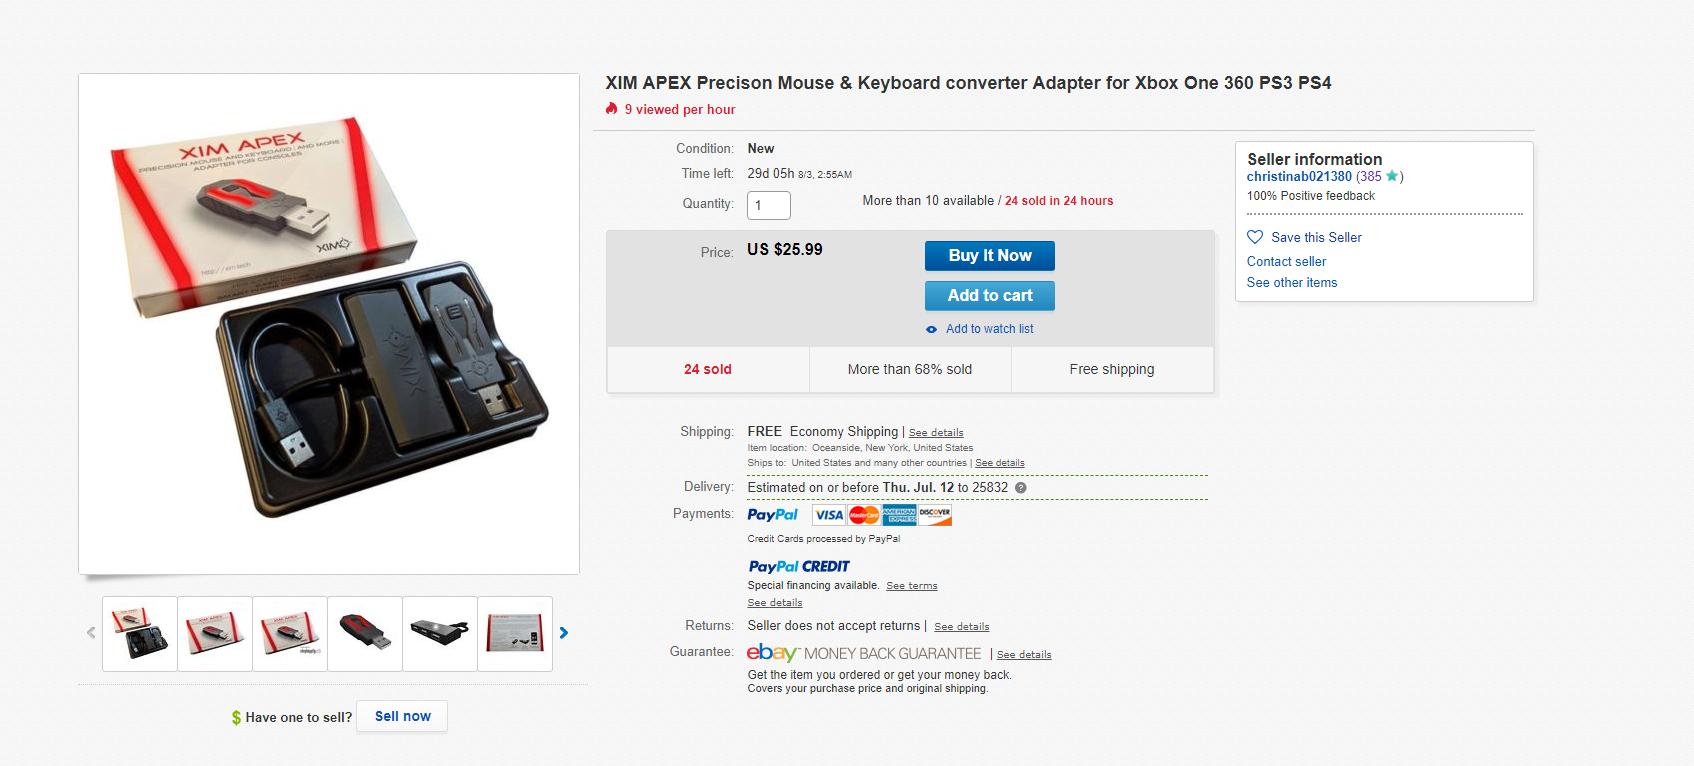 Ebay Xim Apex? Too good to be true?